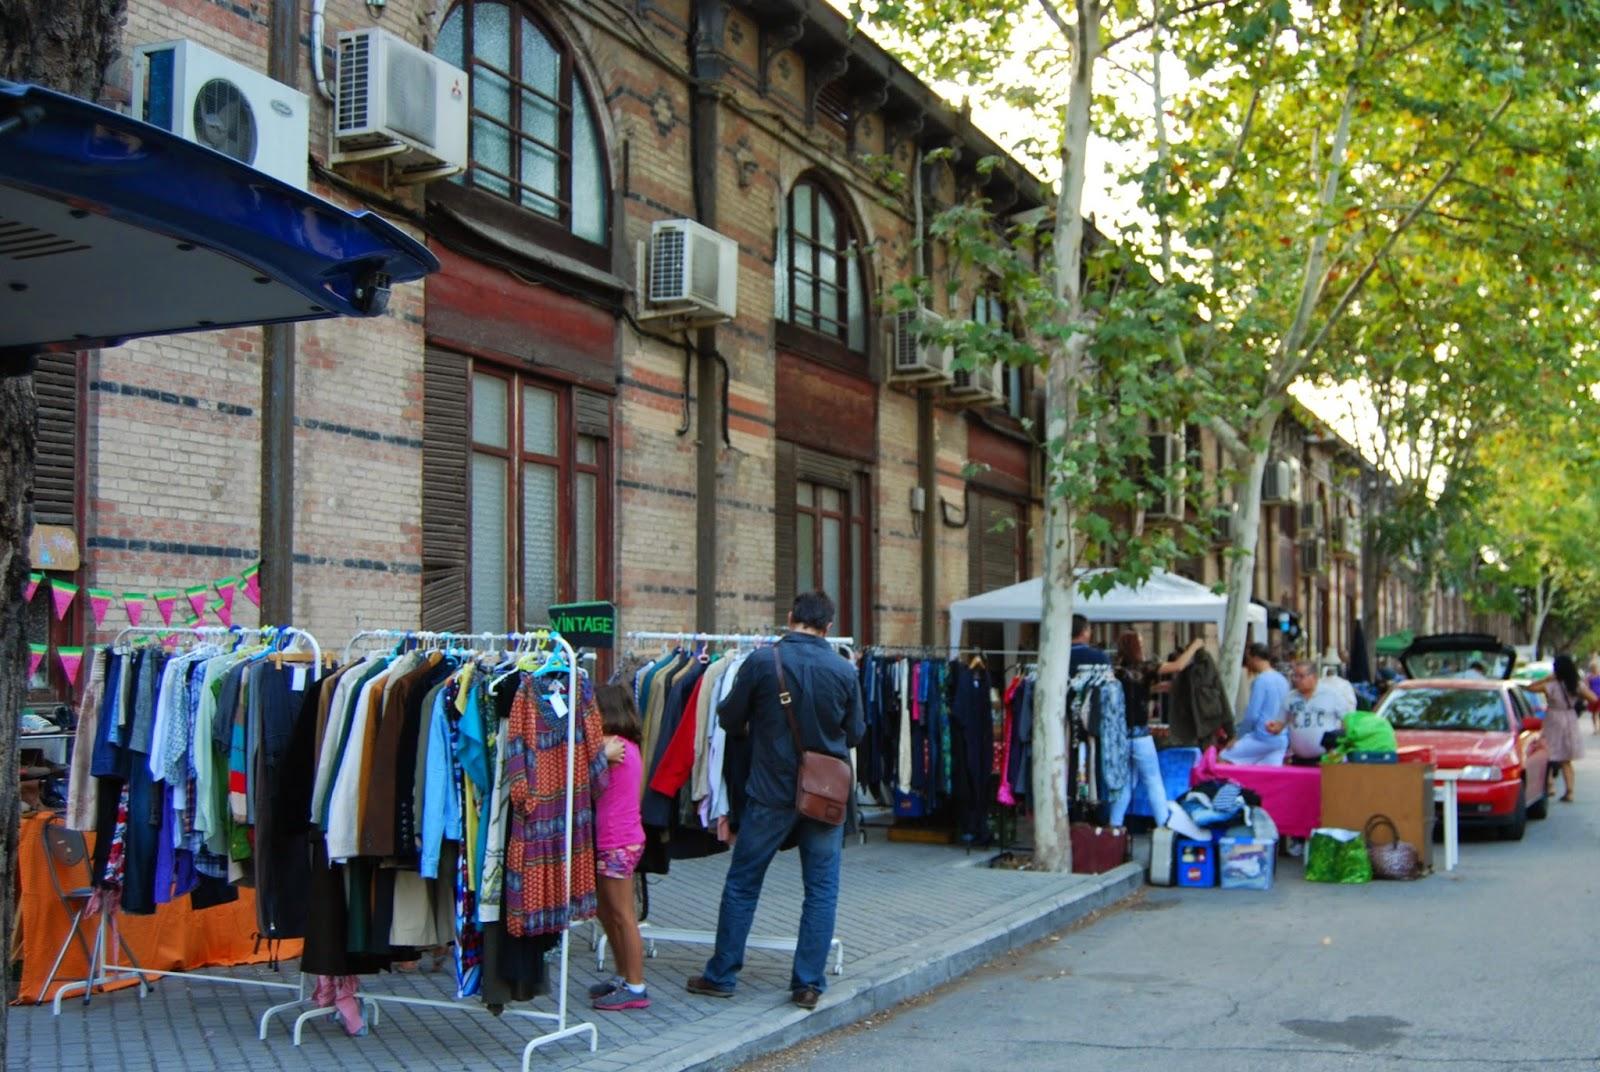 http://sosunnyblog.blogspot.com.es/2014/09/madrid-para-principiantes-mercado-de.html